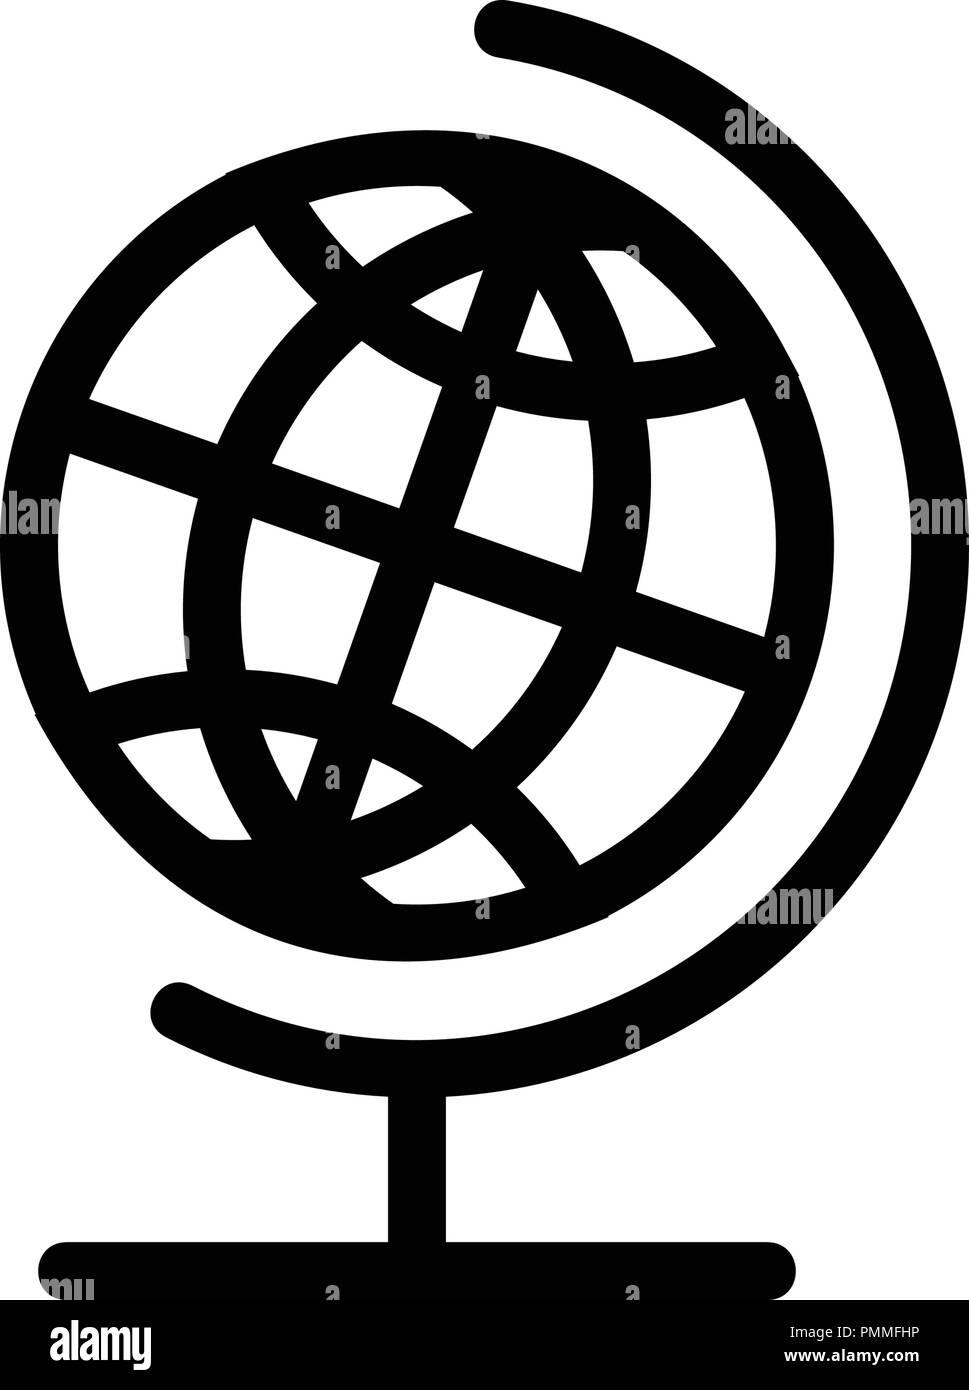 Globe Icon Black and White Stock Photos & Images - Alamy